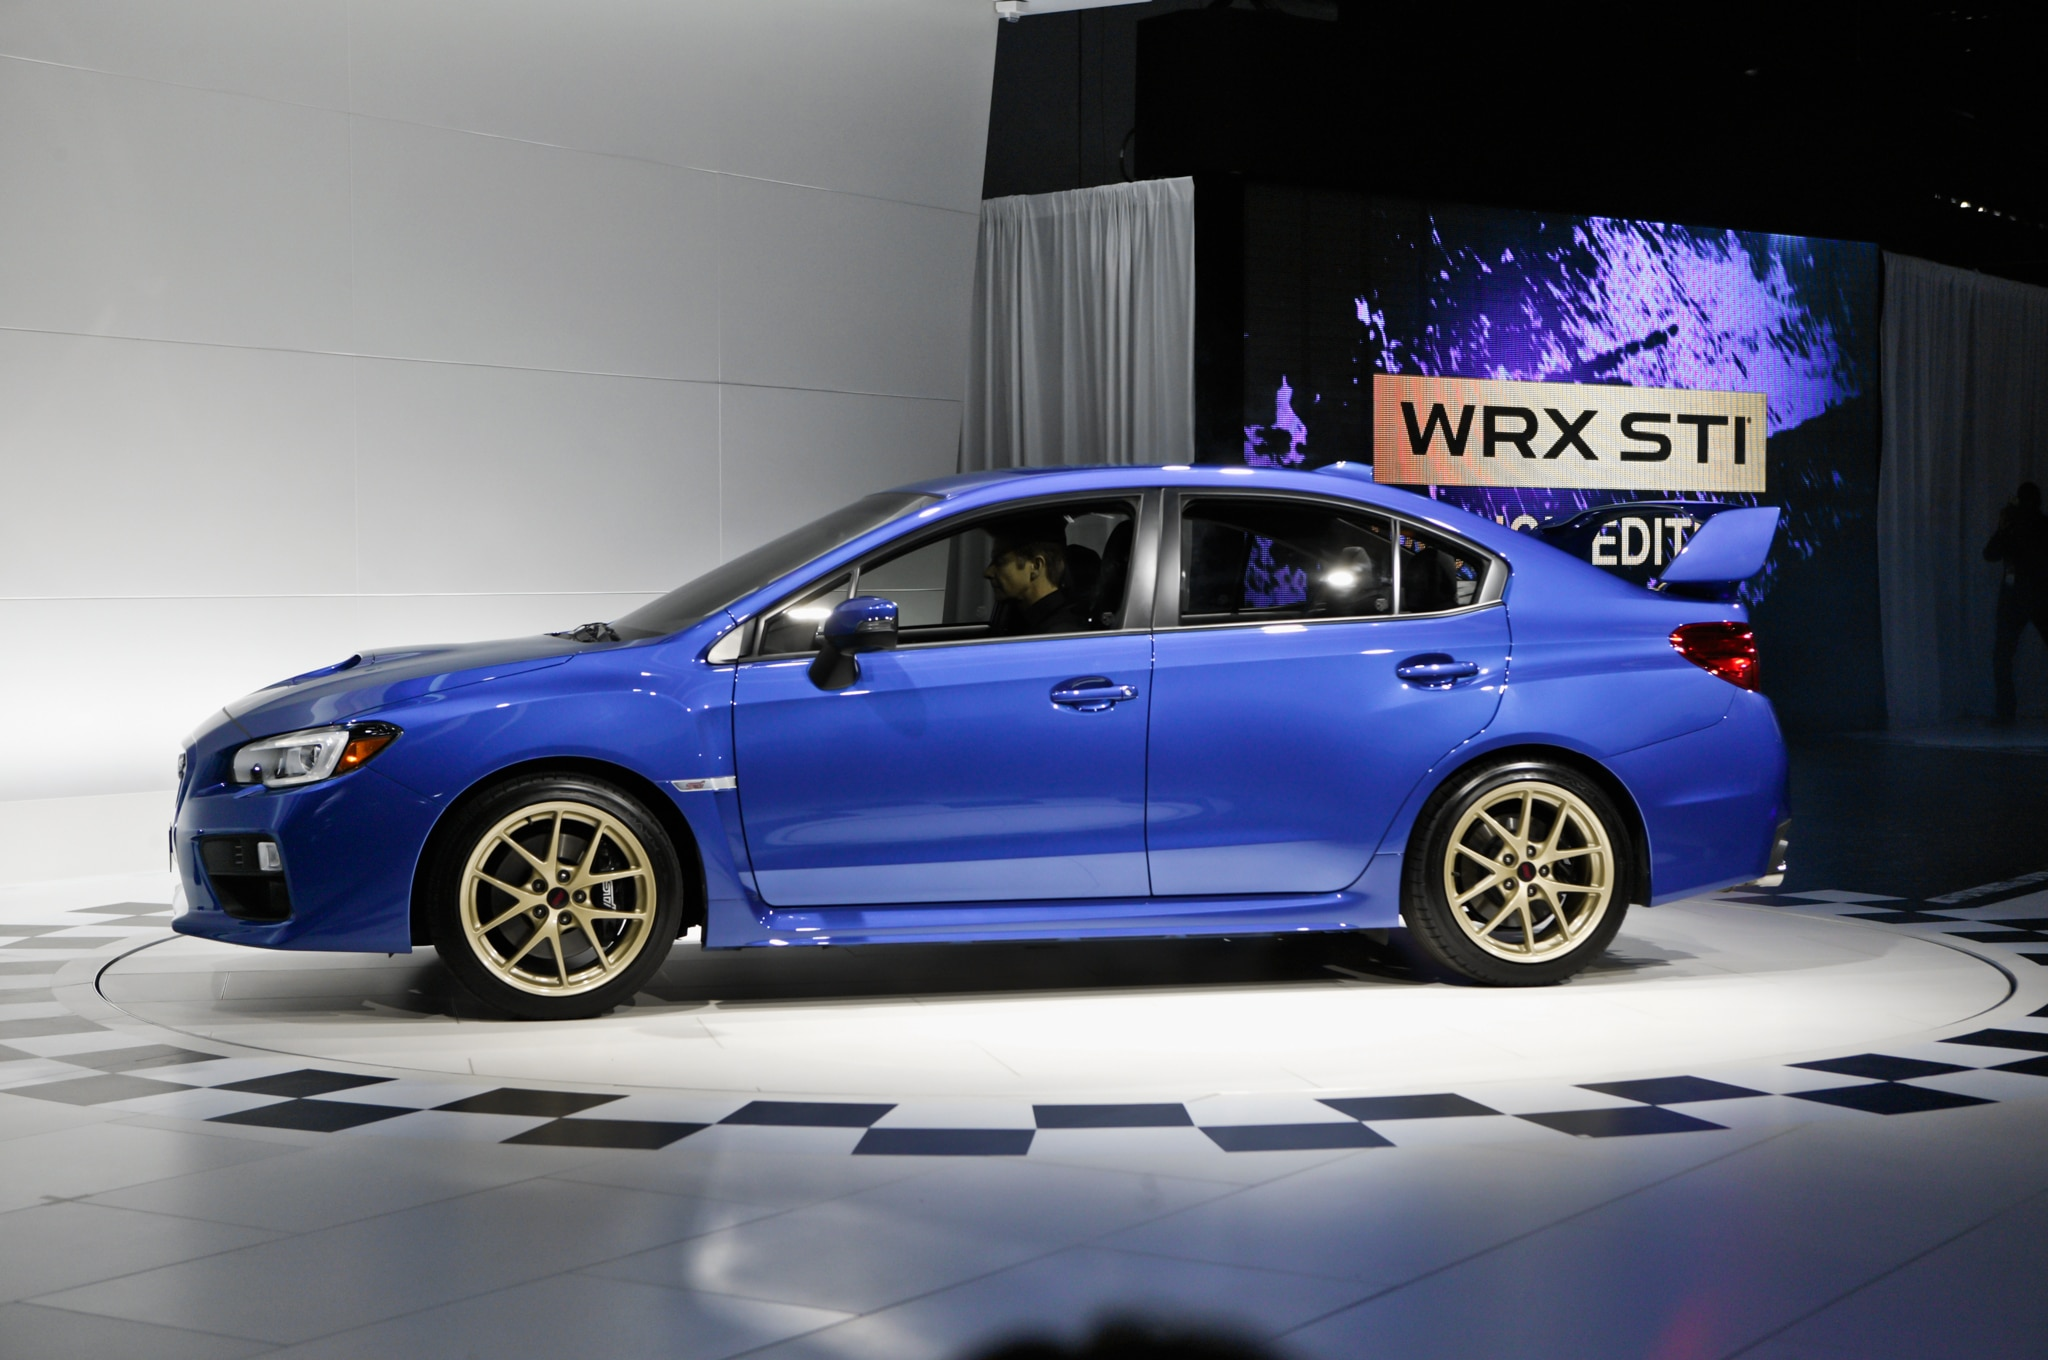 2015 Wrx Sti Launch Edition >> Detroit 2014: 2015 Subaru WRX STI Continues Its Go-Fast Legacy - Automobile Magazine